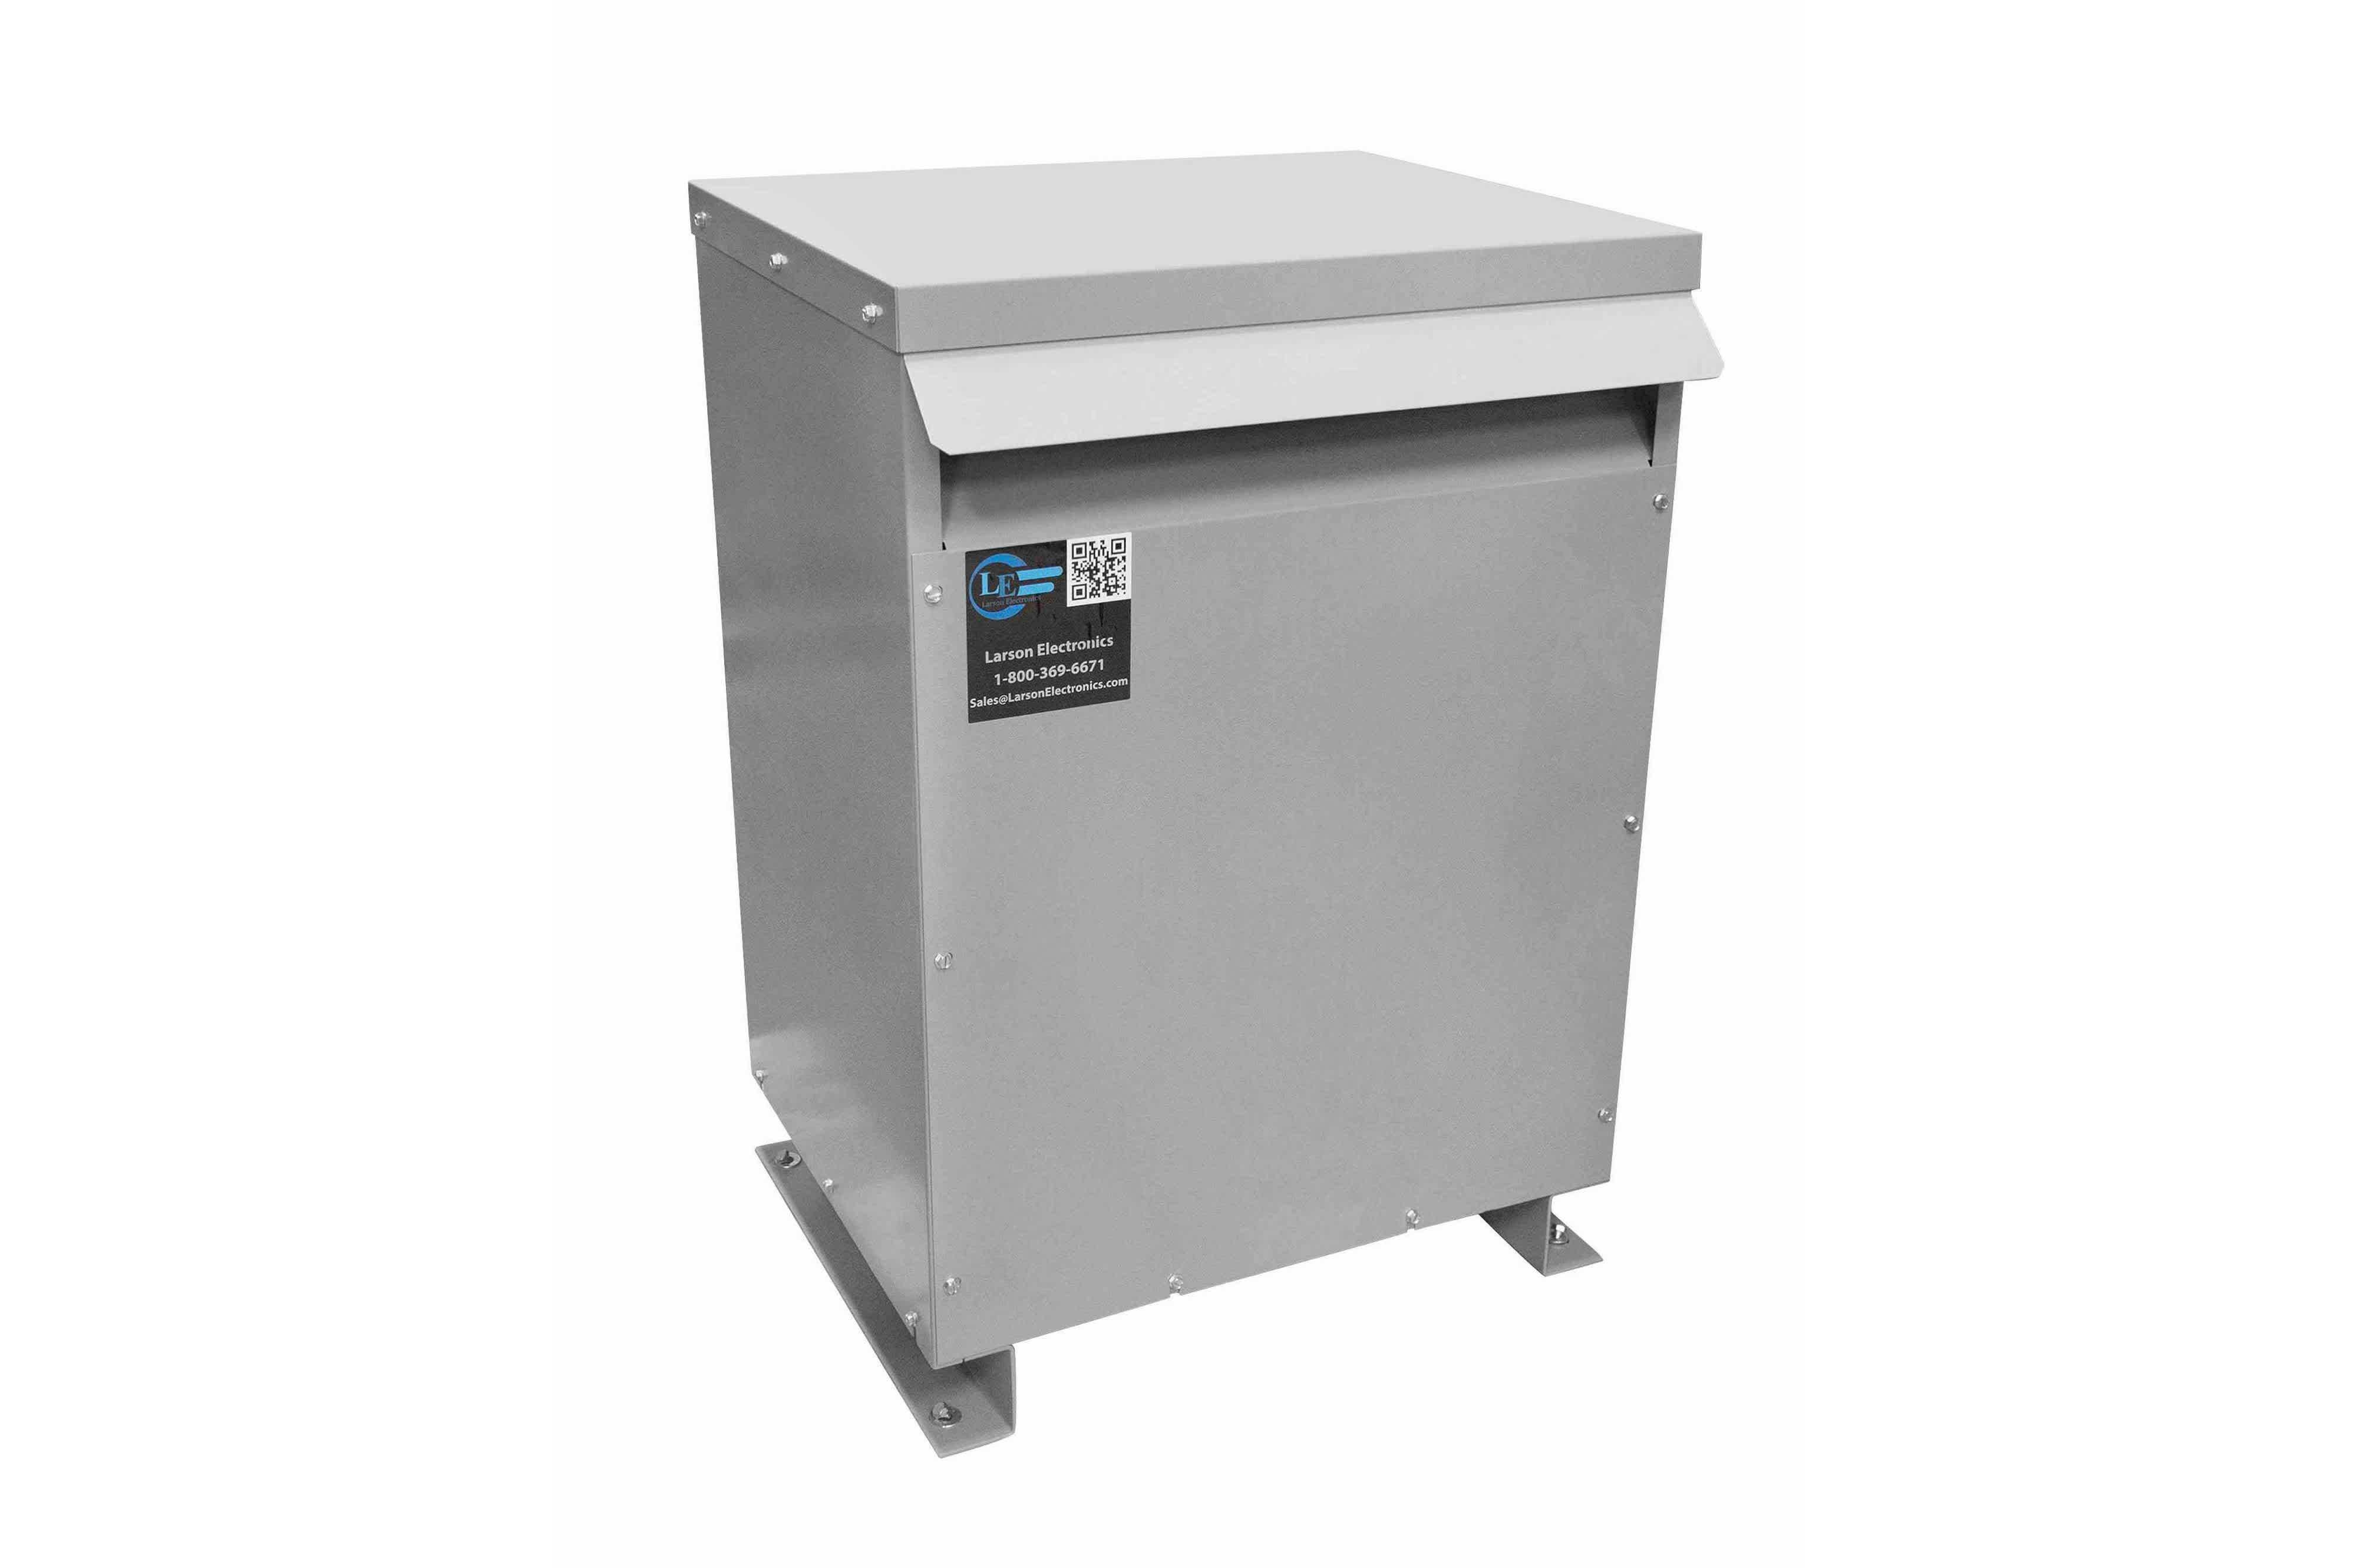 90 kVA 3PH Isolation Transformer, 600V Wye Primary, 480Y/277 Wye-N Secondary, N3R, Ventilated, 60 Hz